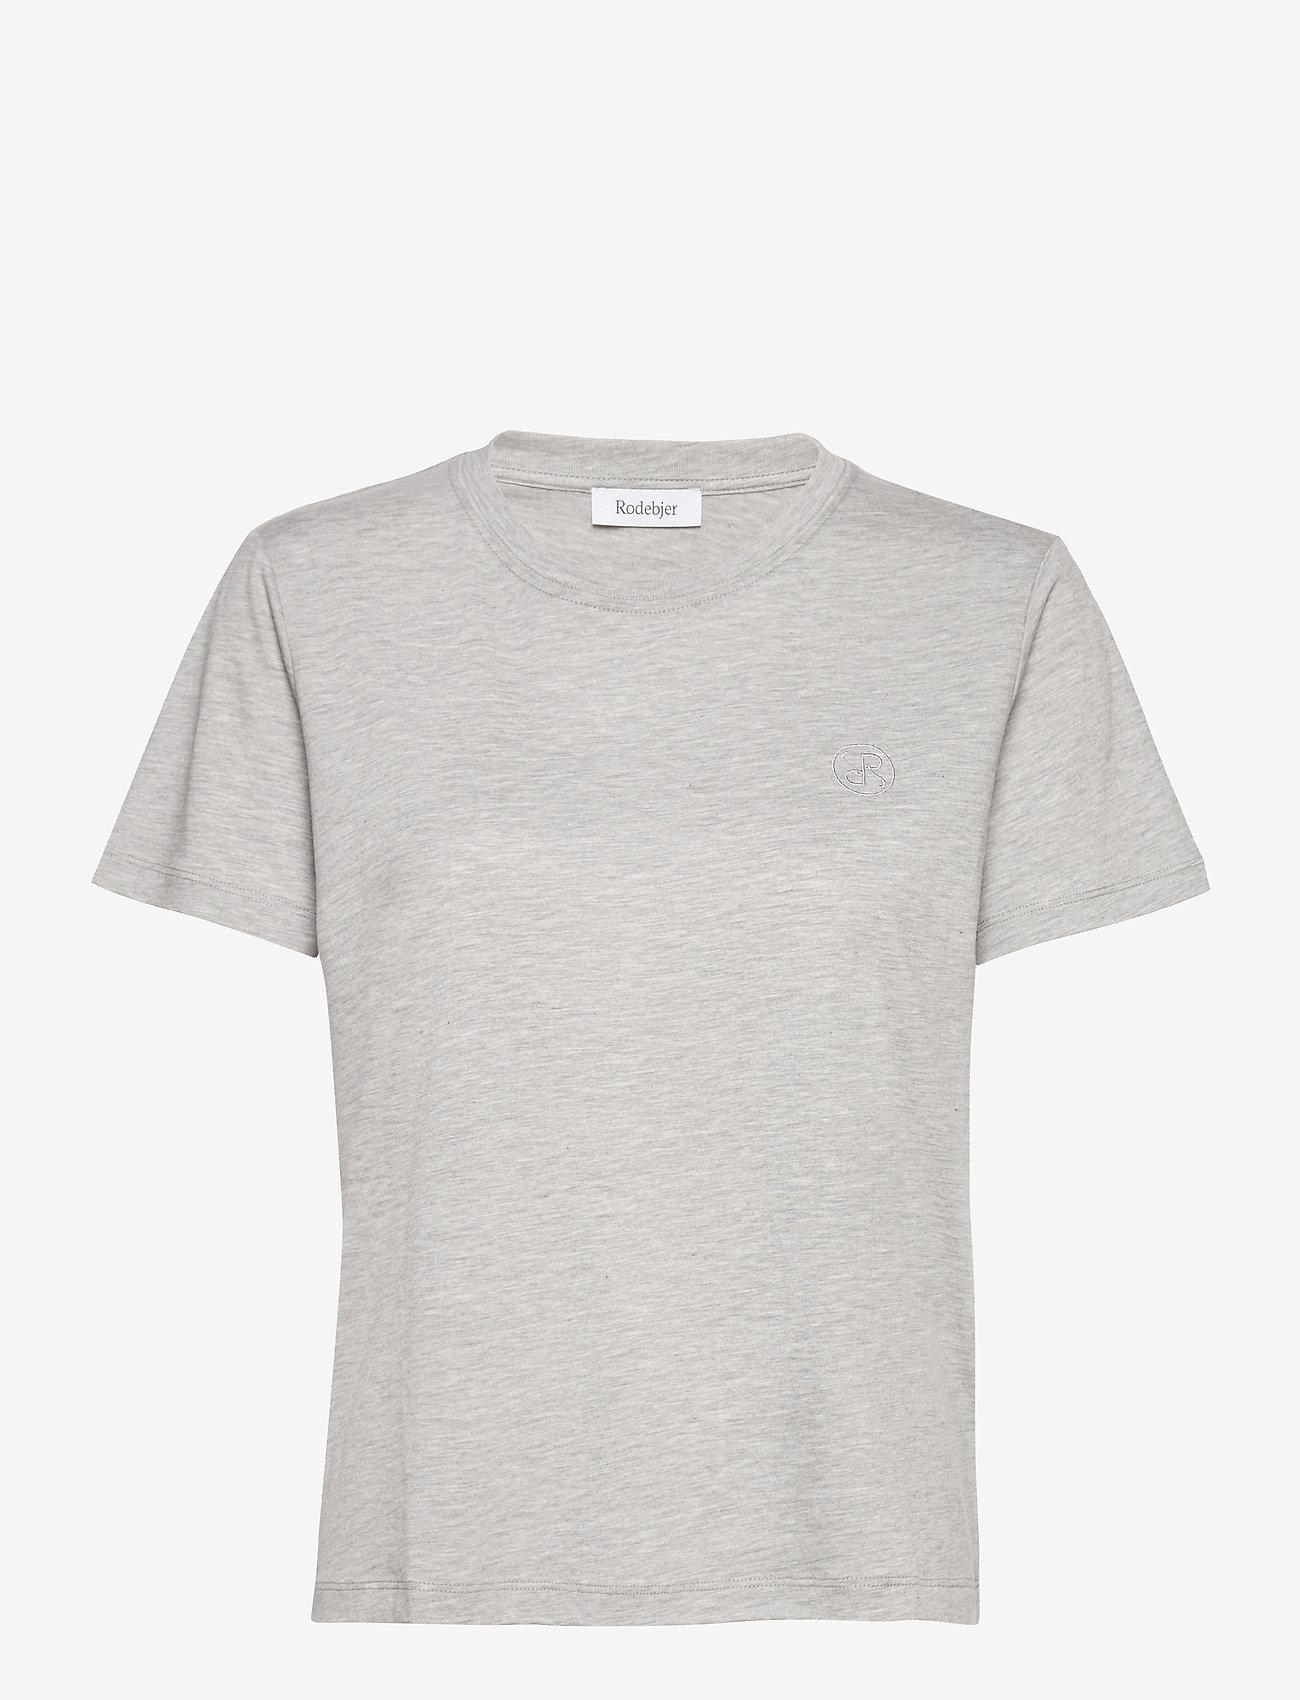 RODEBJER - RODEBJER NINJA LOGO - t-shirts - grey melange - 0